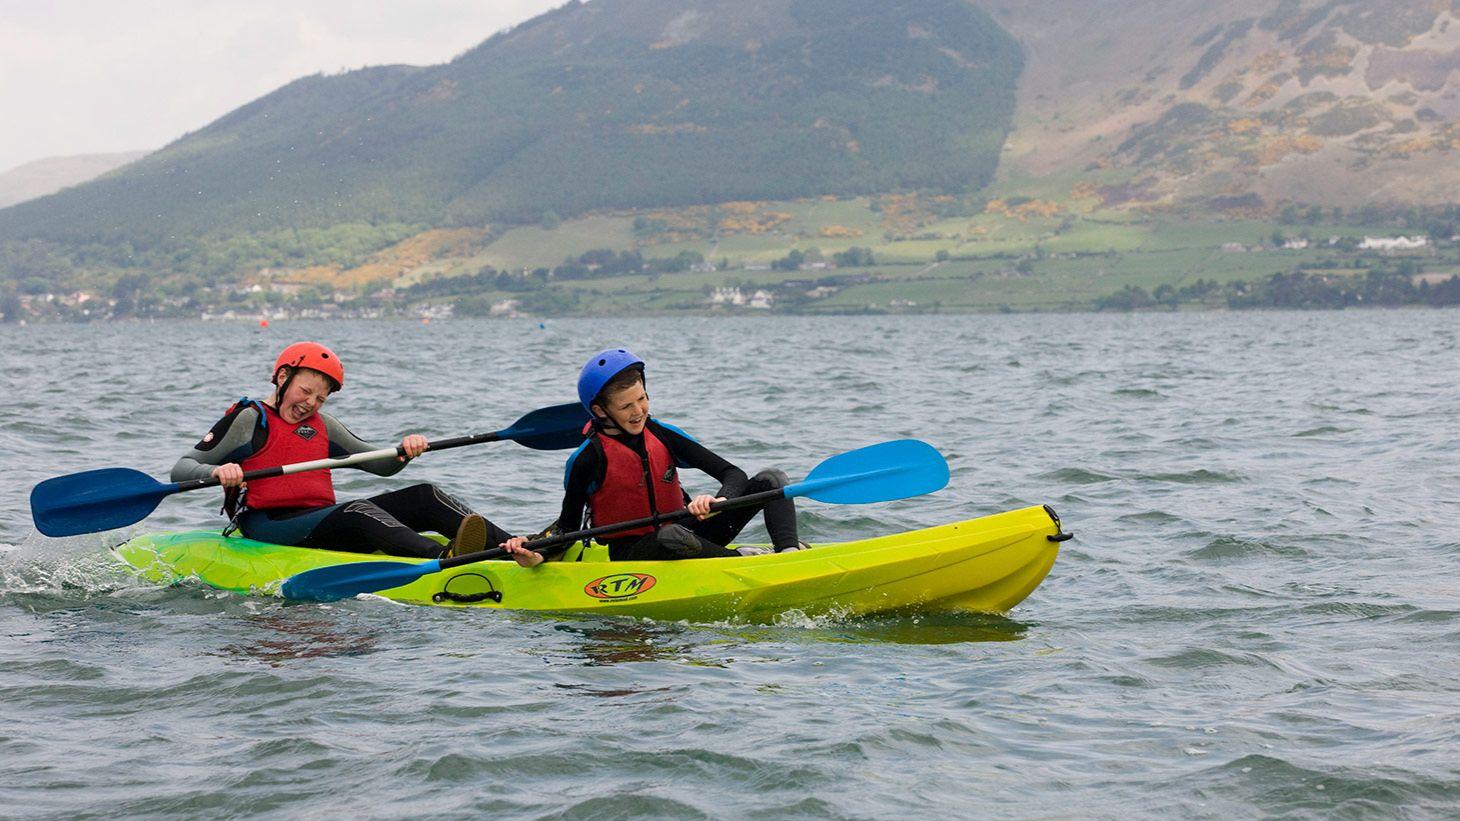 Have fun kayaking at Carlingford Adventure Centre and Skypark.